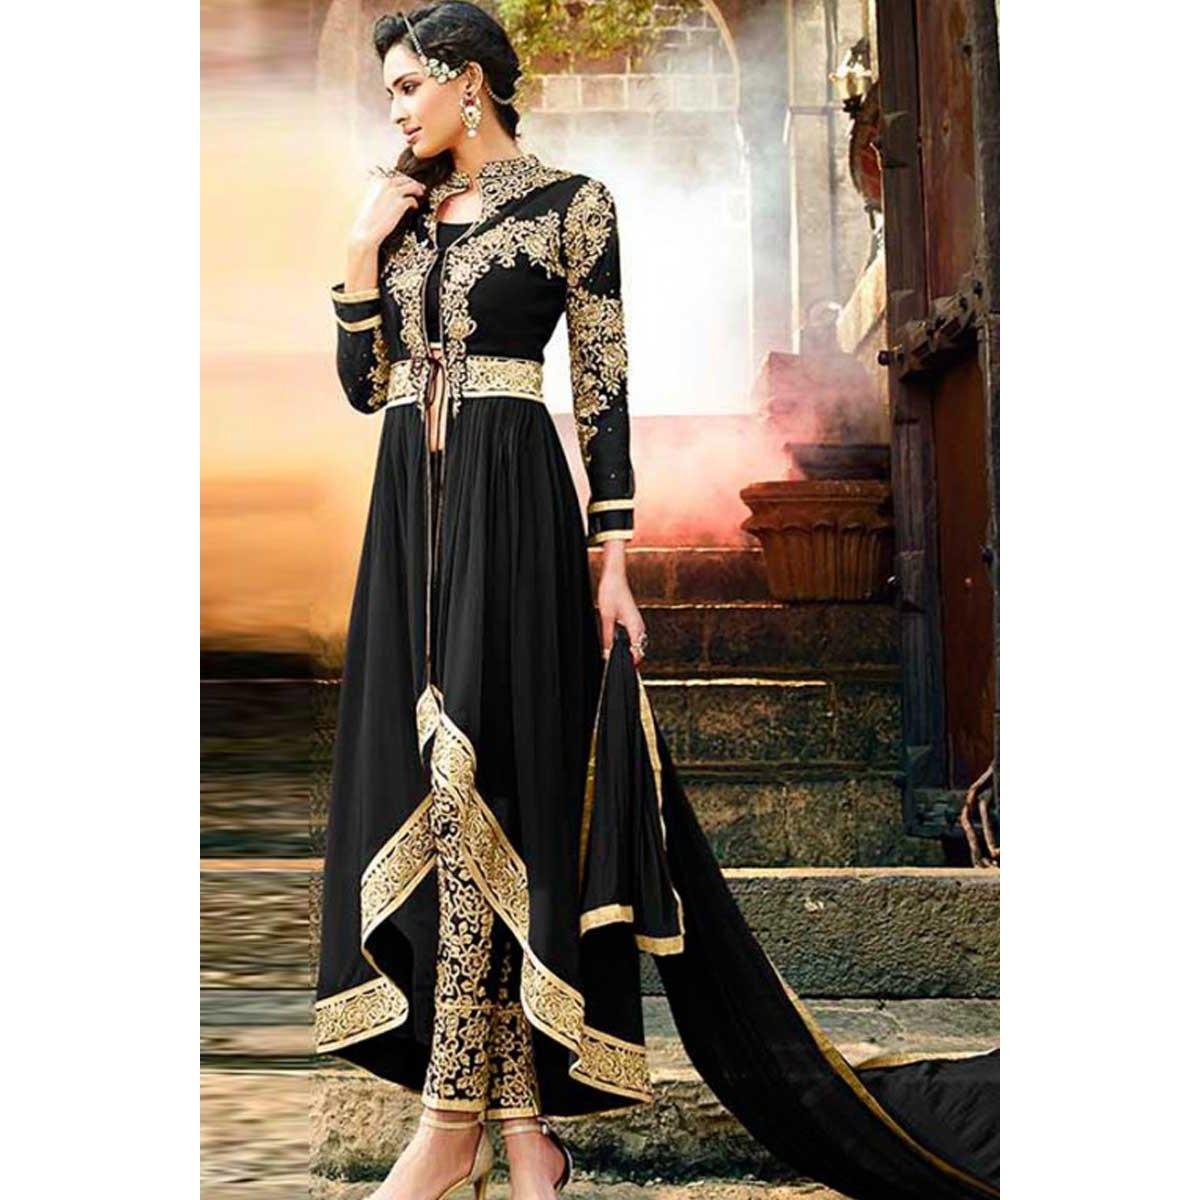 1689f82a42 Buy Black Georgette Trail Cut Anarkali Suit With Cigarette Pant Online -  dmv13914 | Andaaz Fashion